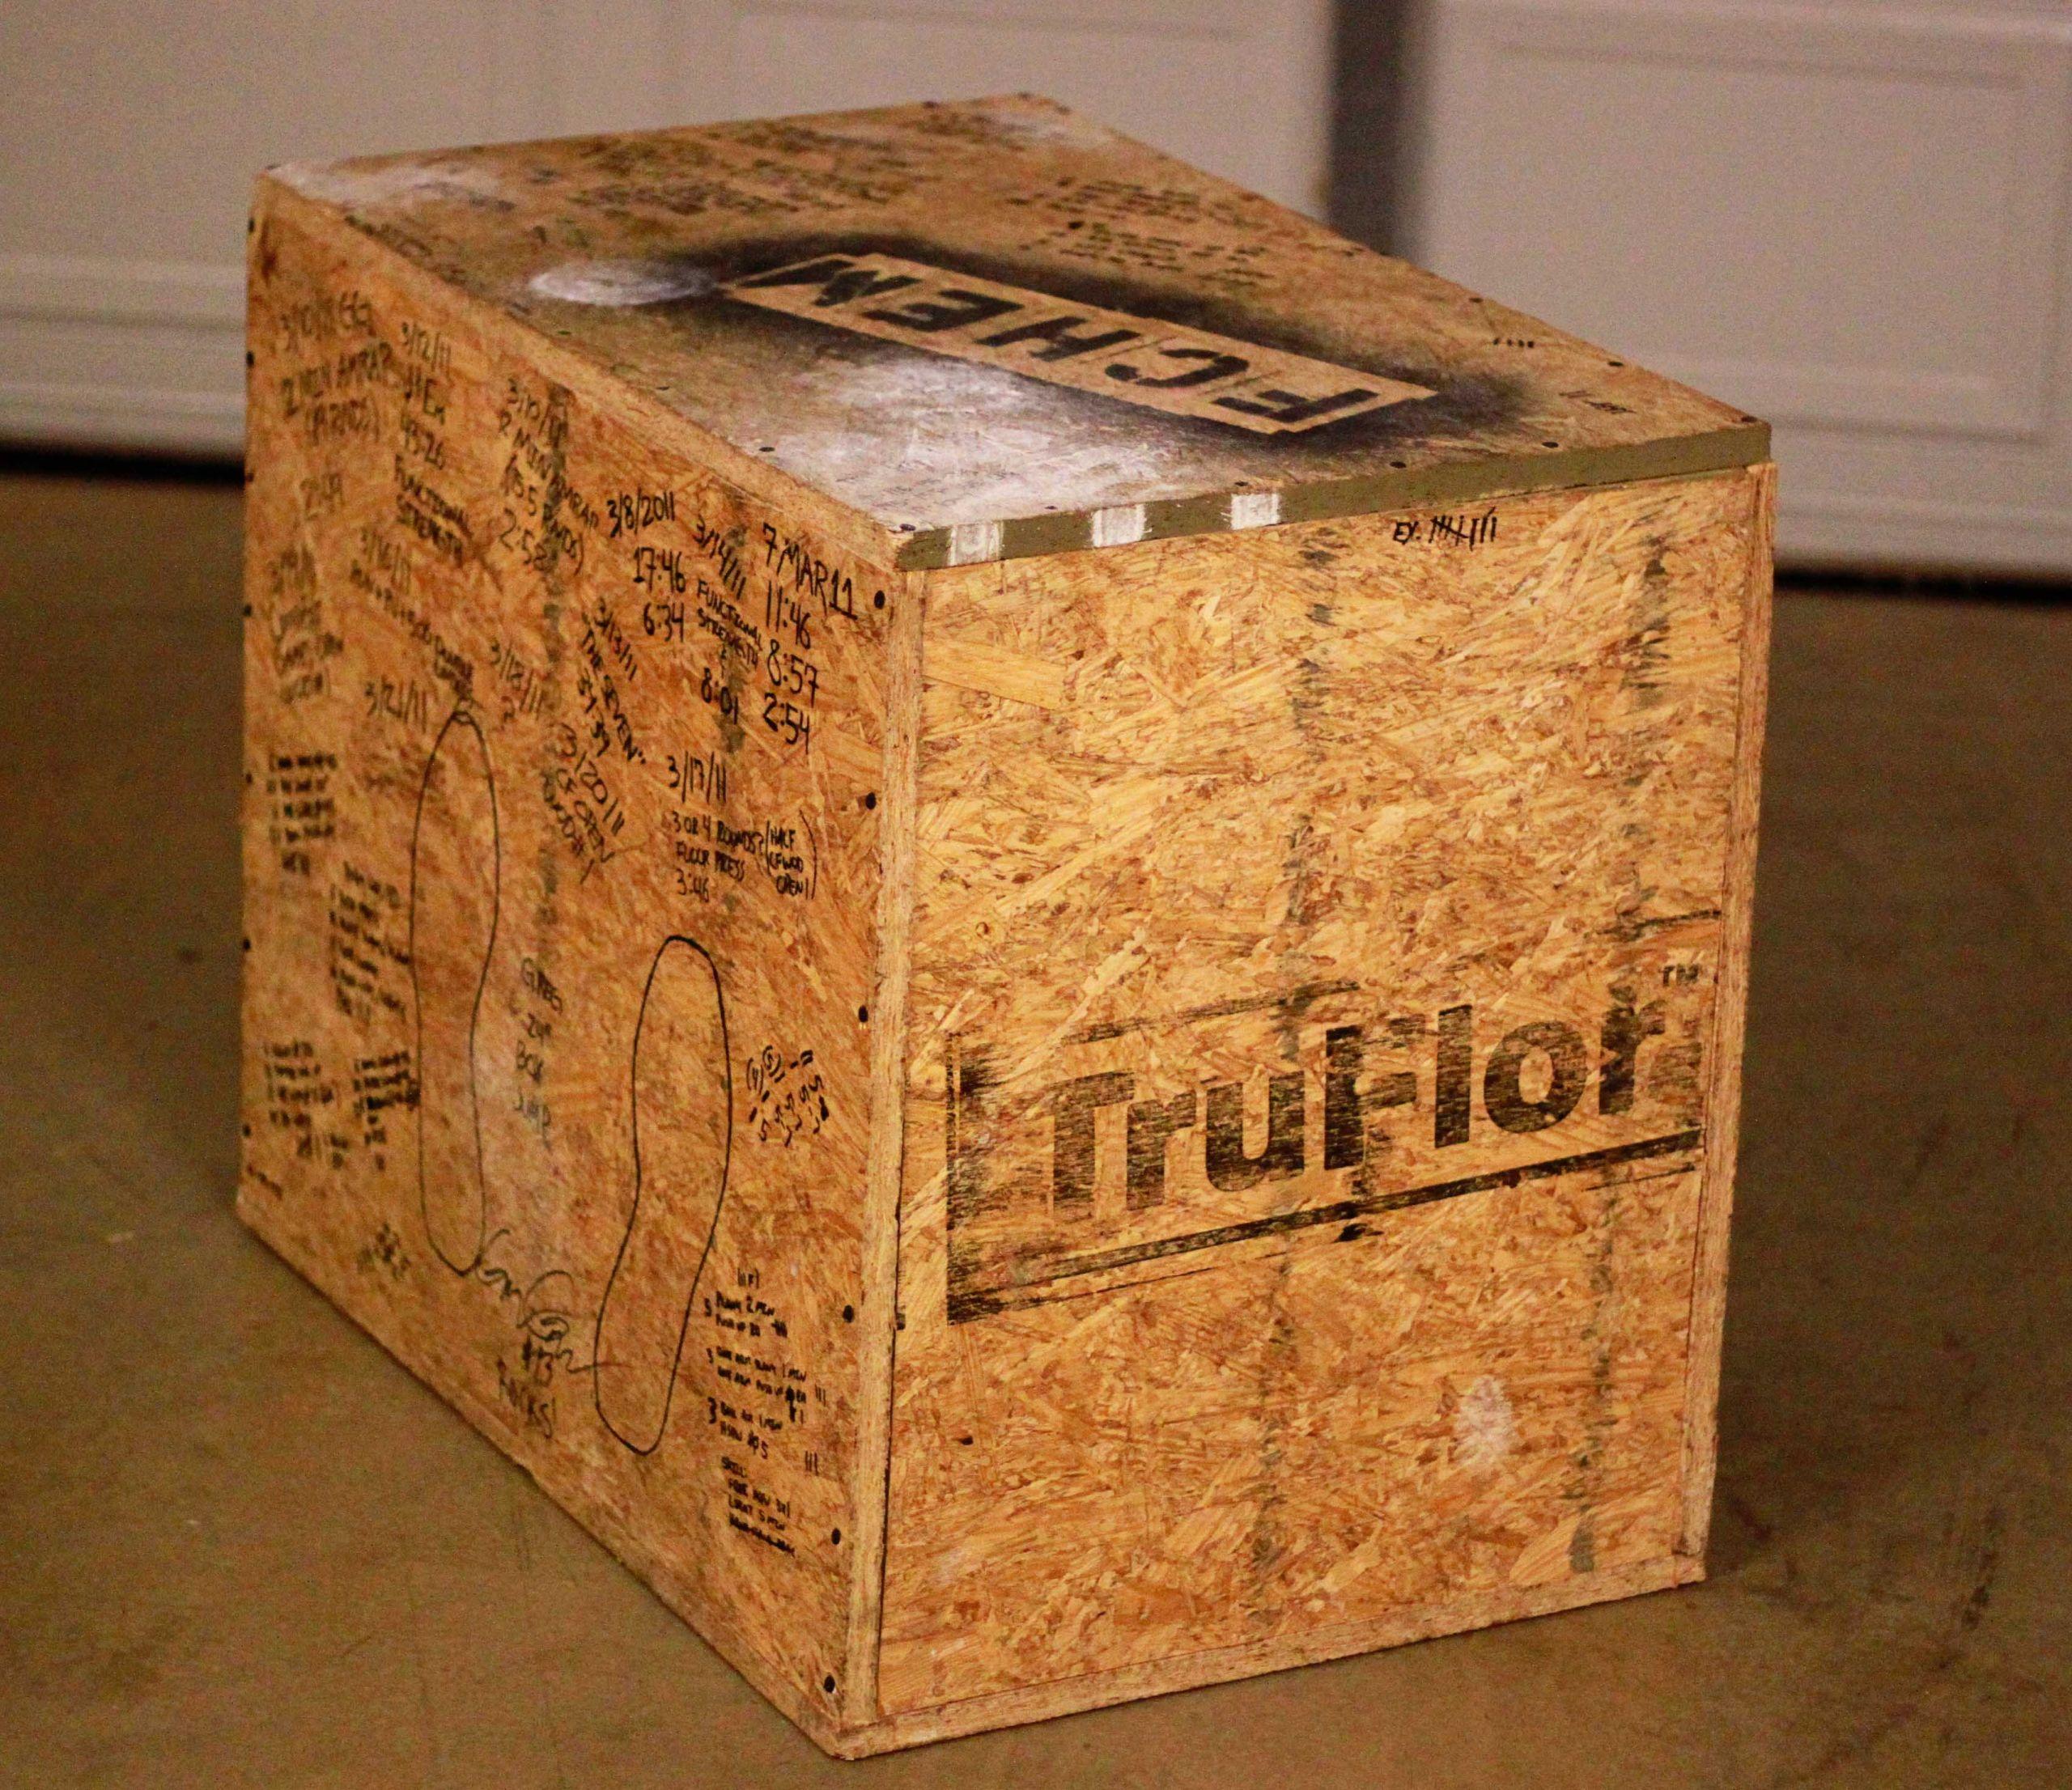 DIY Plyometric Box  How to Build a Plyometric Box End of Three Fitness